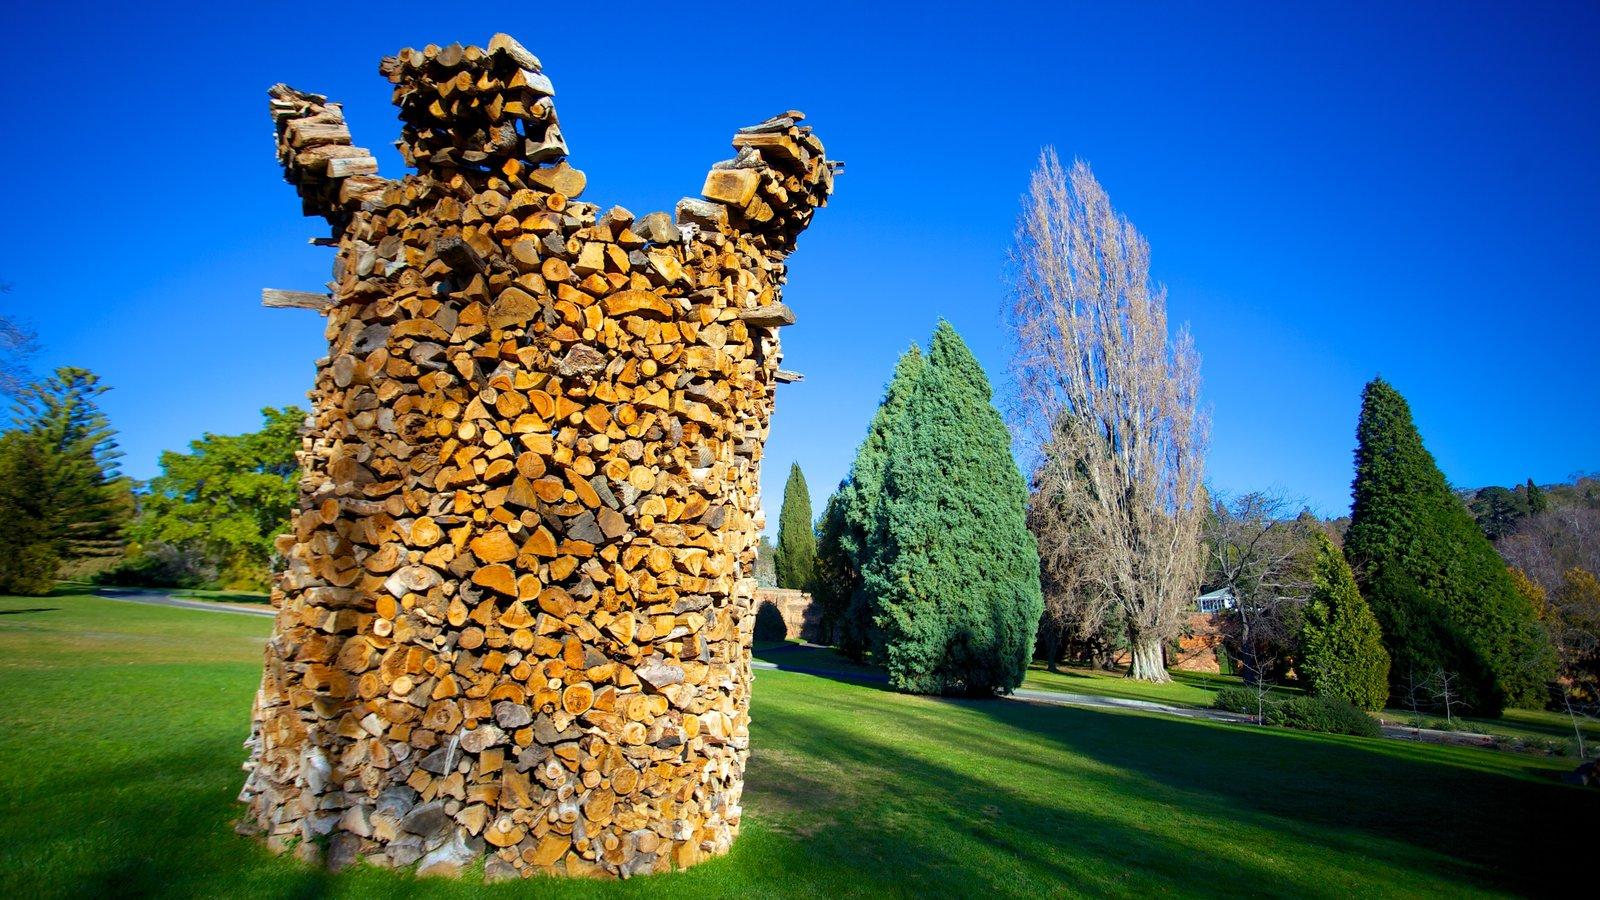 Royal Tasmanian Botanical Gardens featuring outdoor art and a park